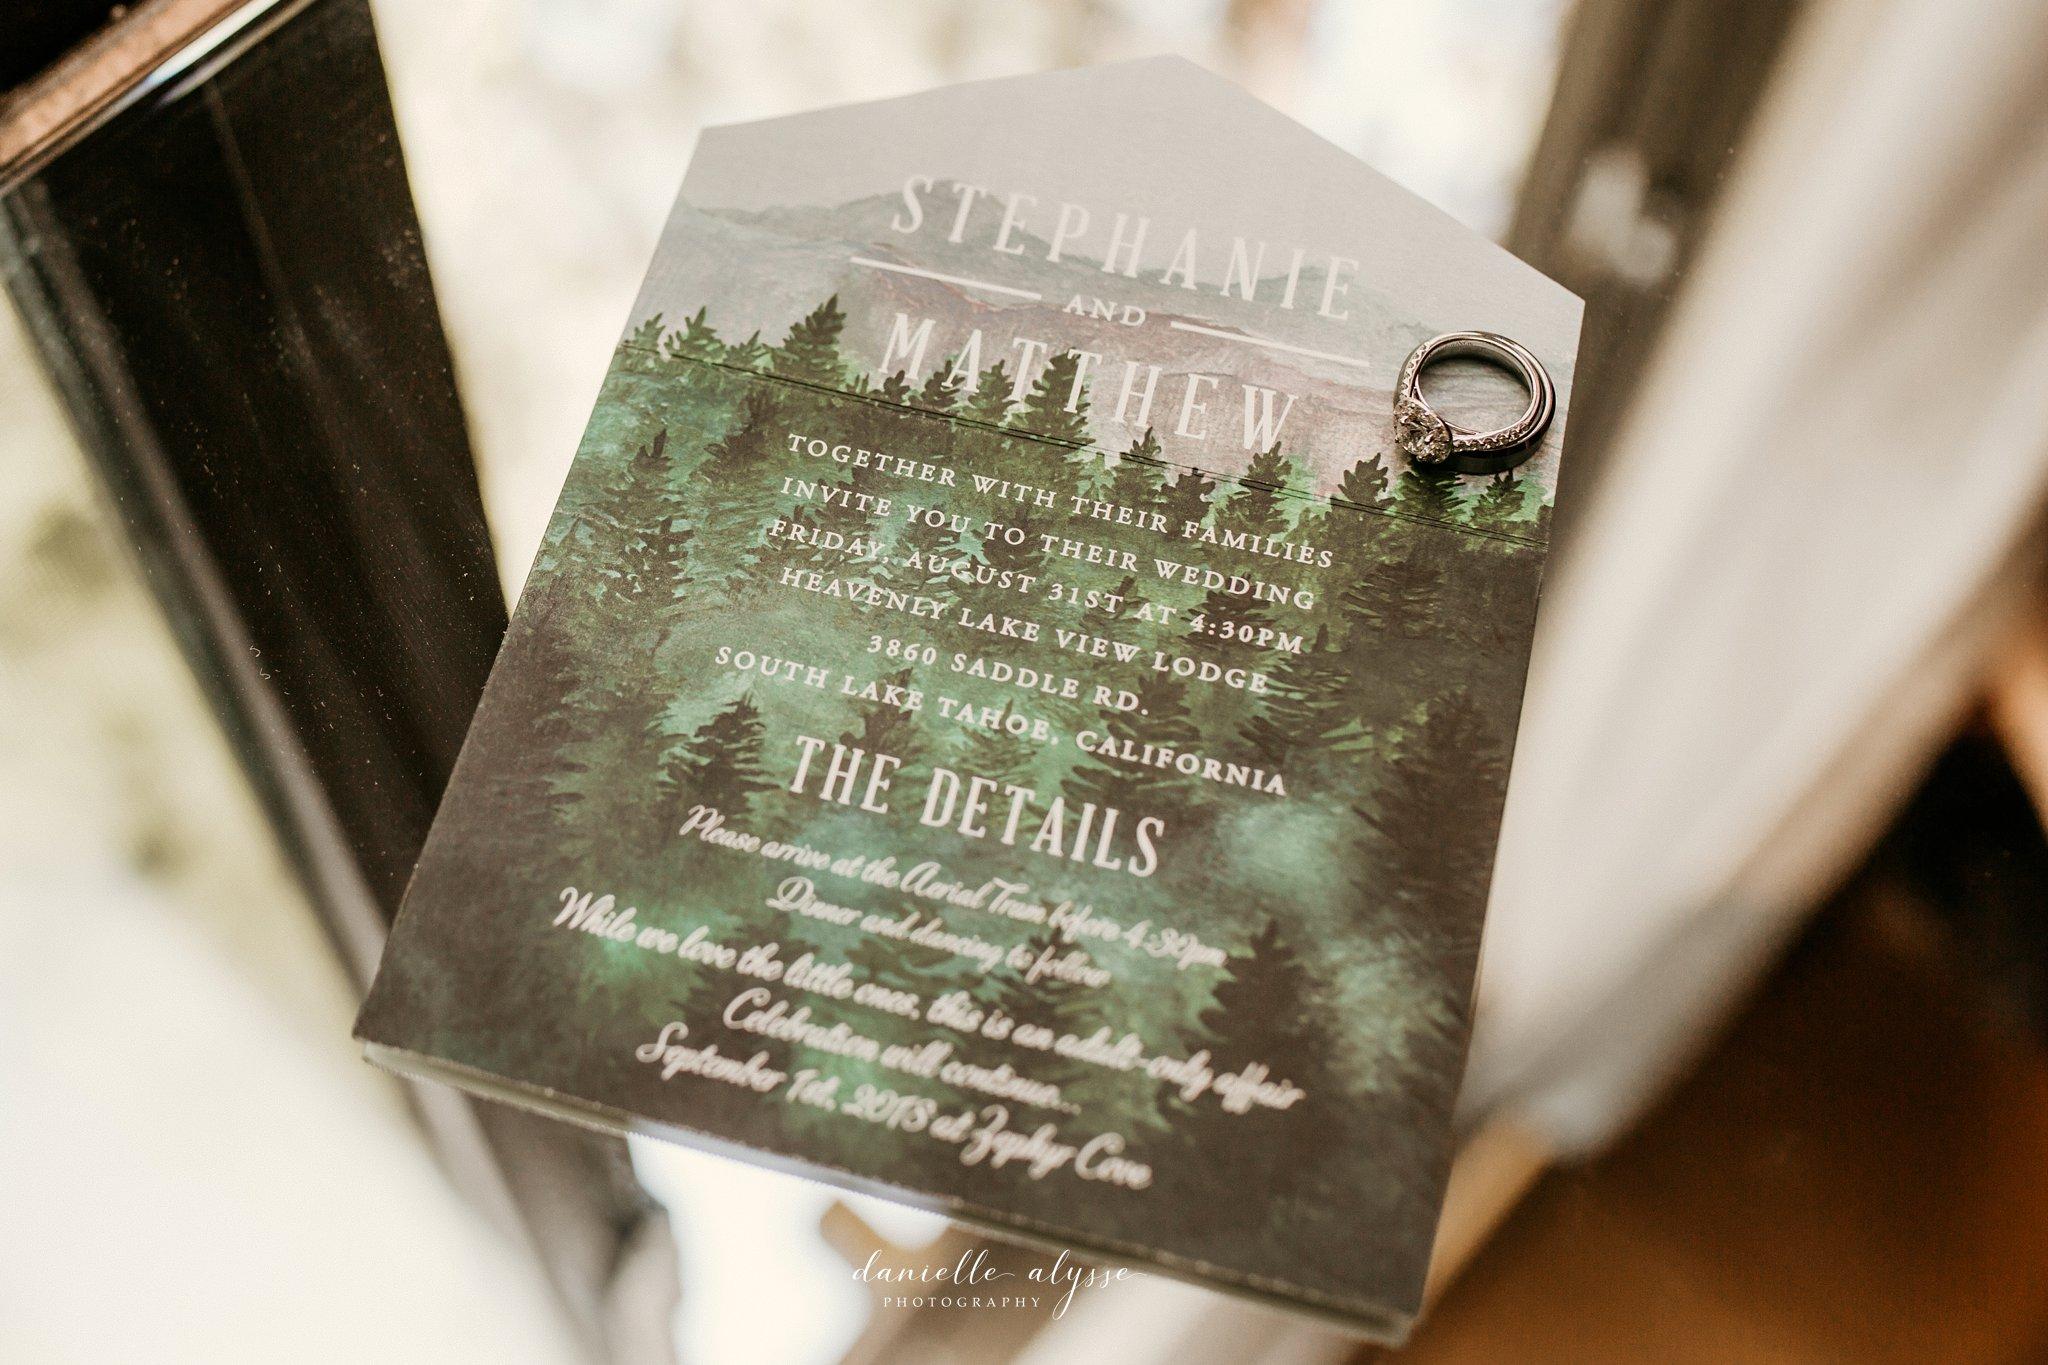 180831_wedding_stephanie_heavenly_south_lake_tahoe_danielle_alysse_photography_destination_blog_14_WEB.jpg